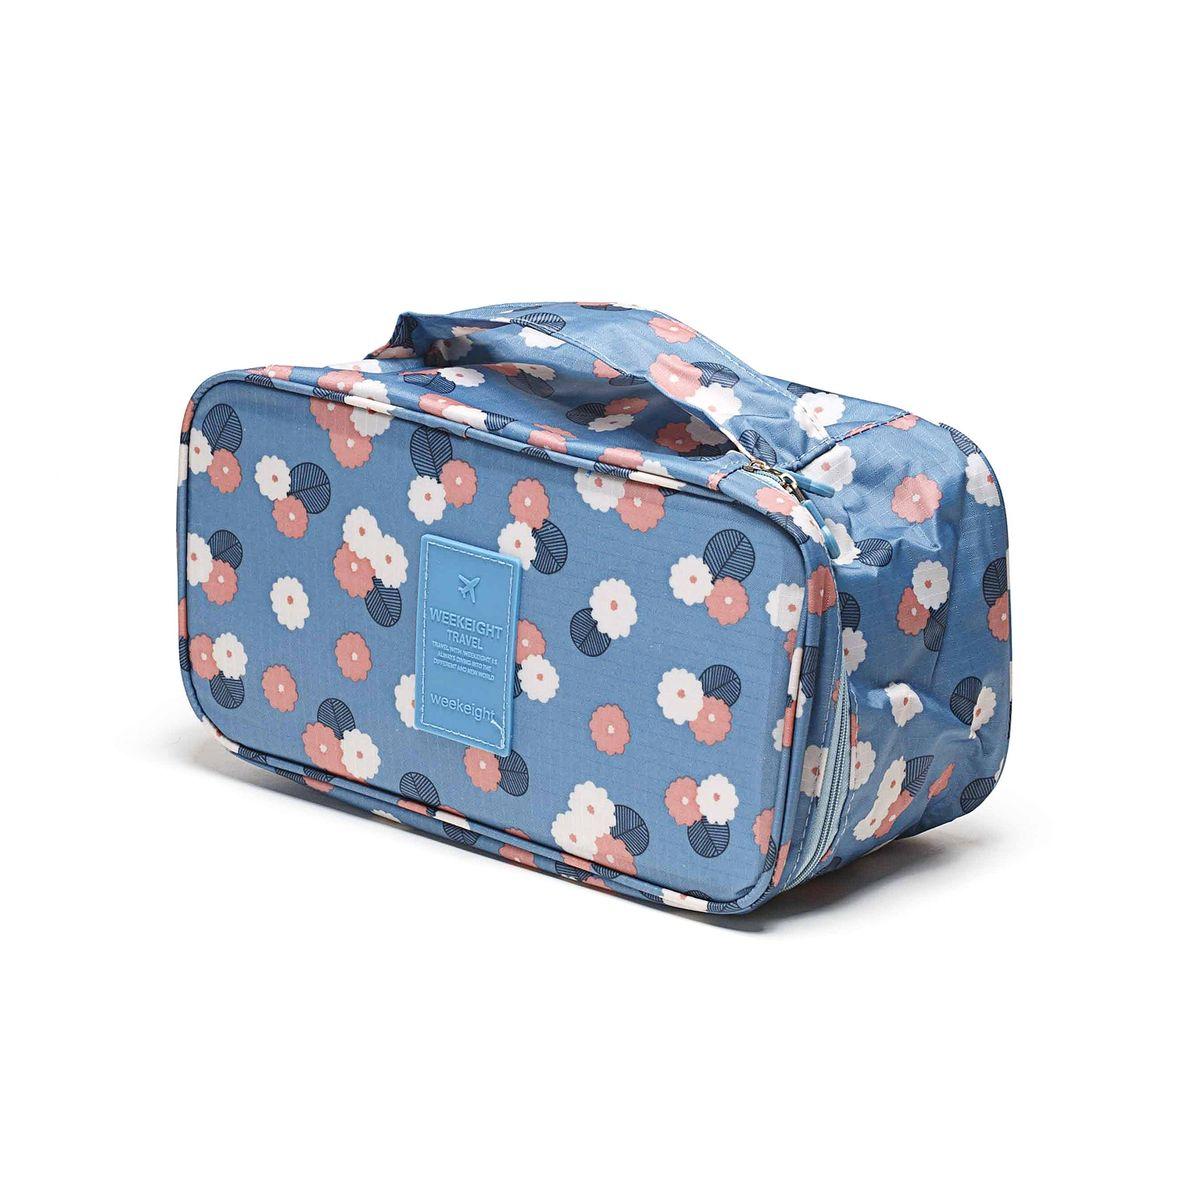 Косметичка-органайзер Homsu Цветок, цвет: синий, белый, розовый, 28 x 13 x 15 см цена